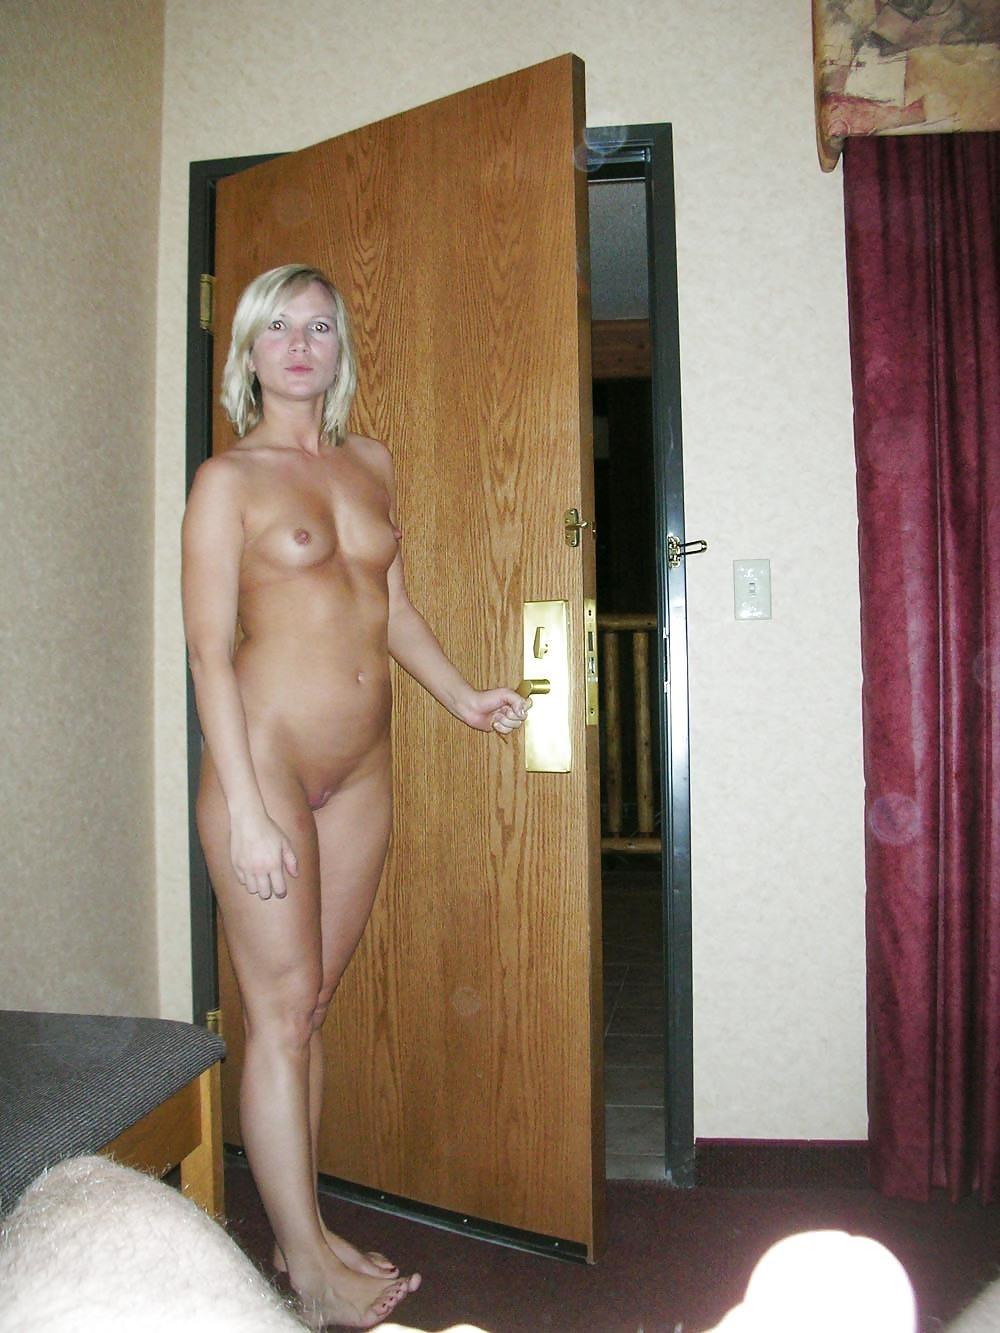 Chubby amateur girls pics-3025